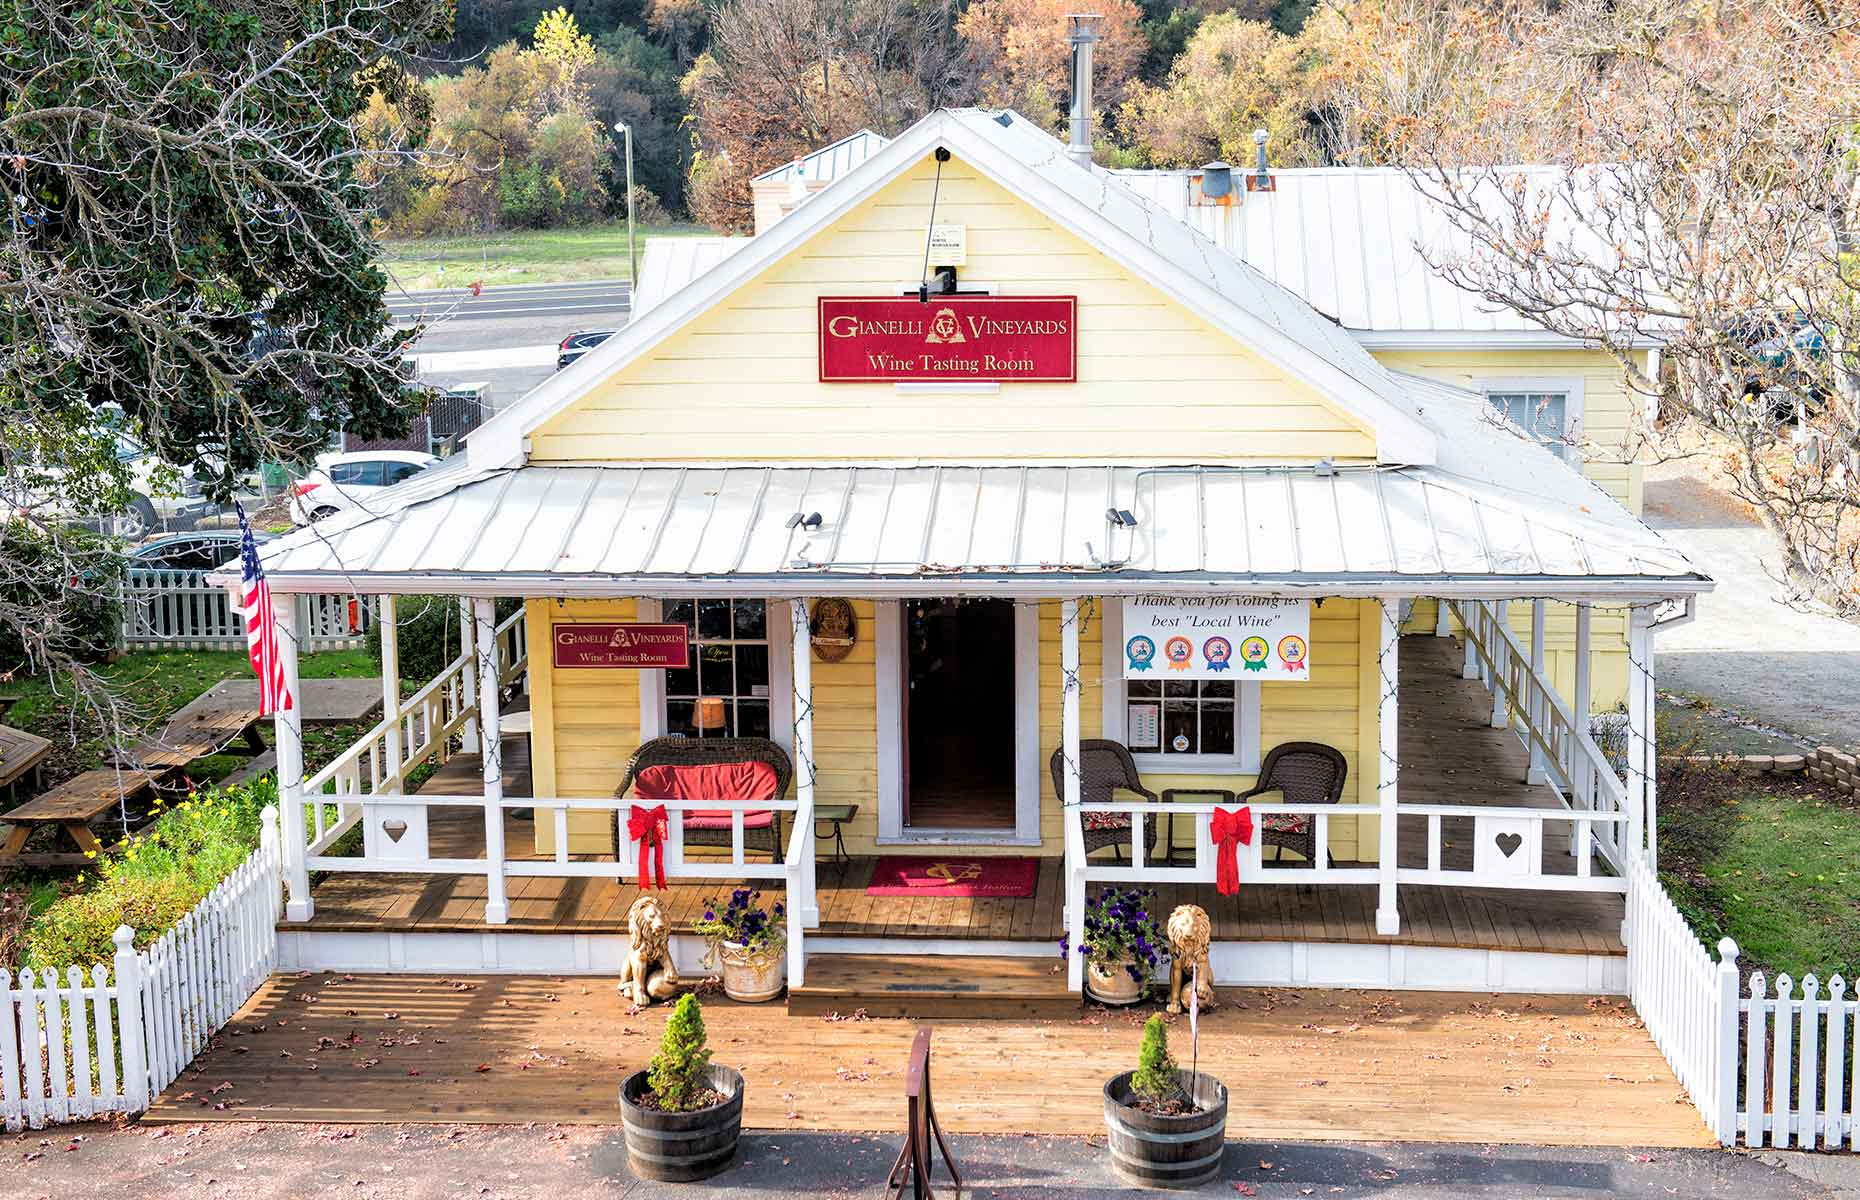 Gianelli Vineyards' wine tasting room in Jamestown (Image: Menka Belgal/Gold Country/Visit Tuolumne County)